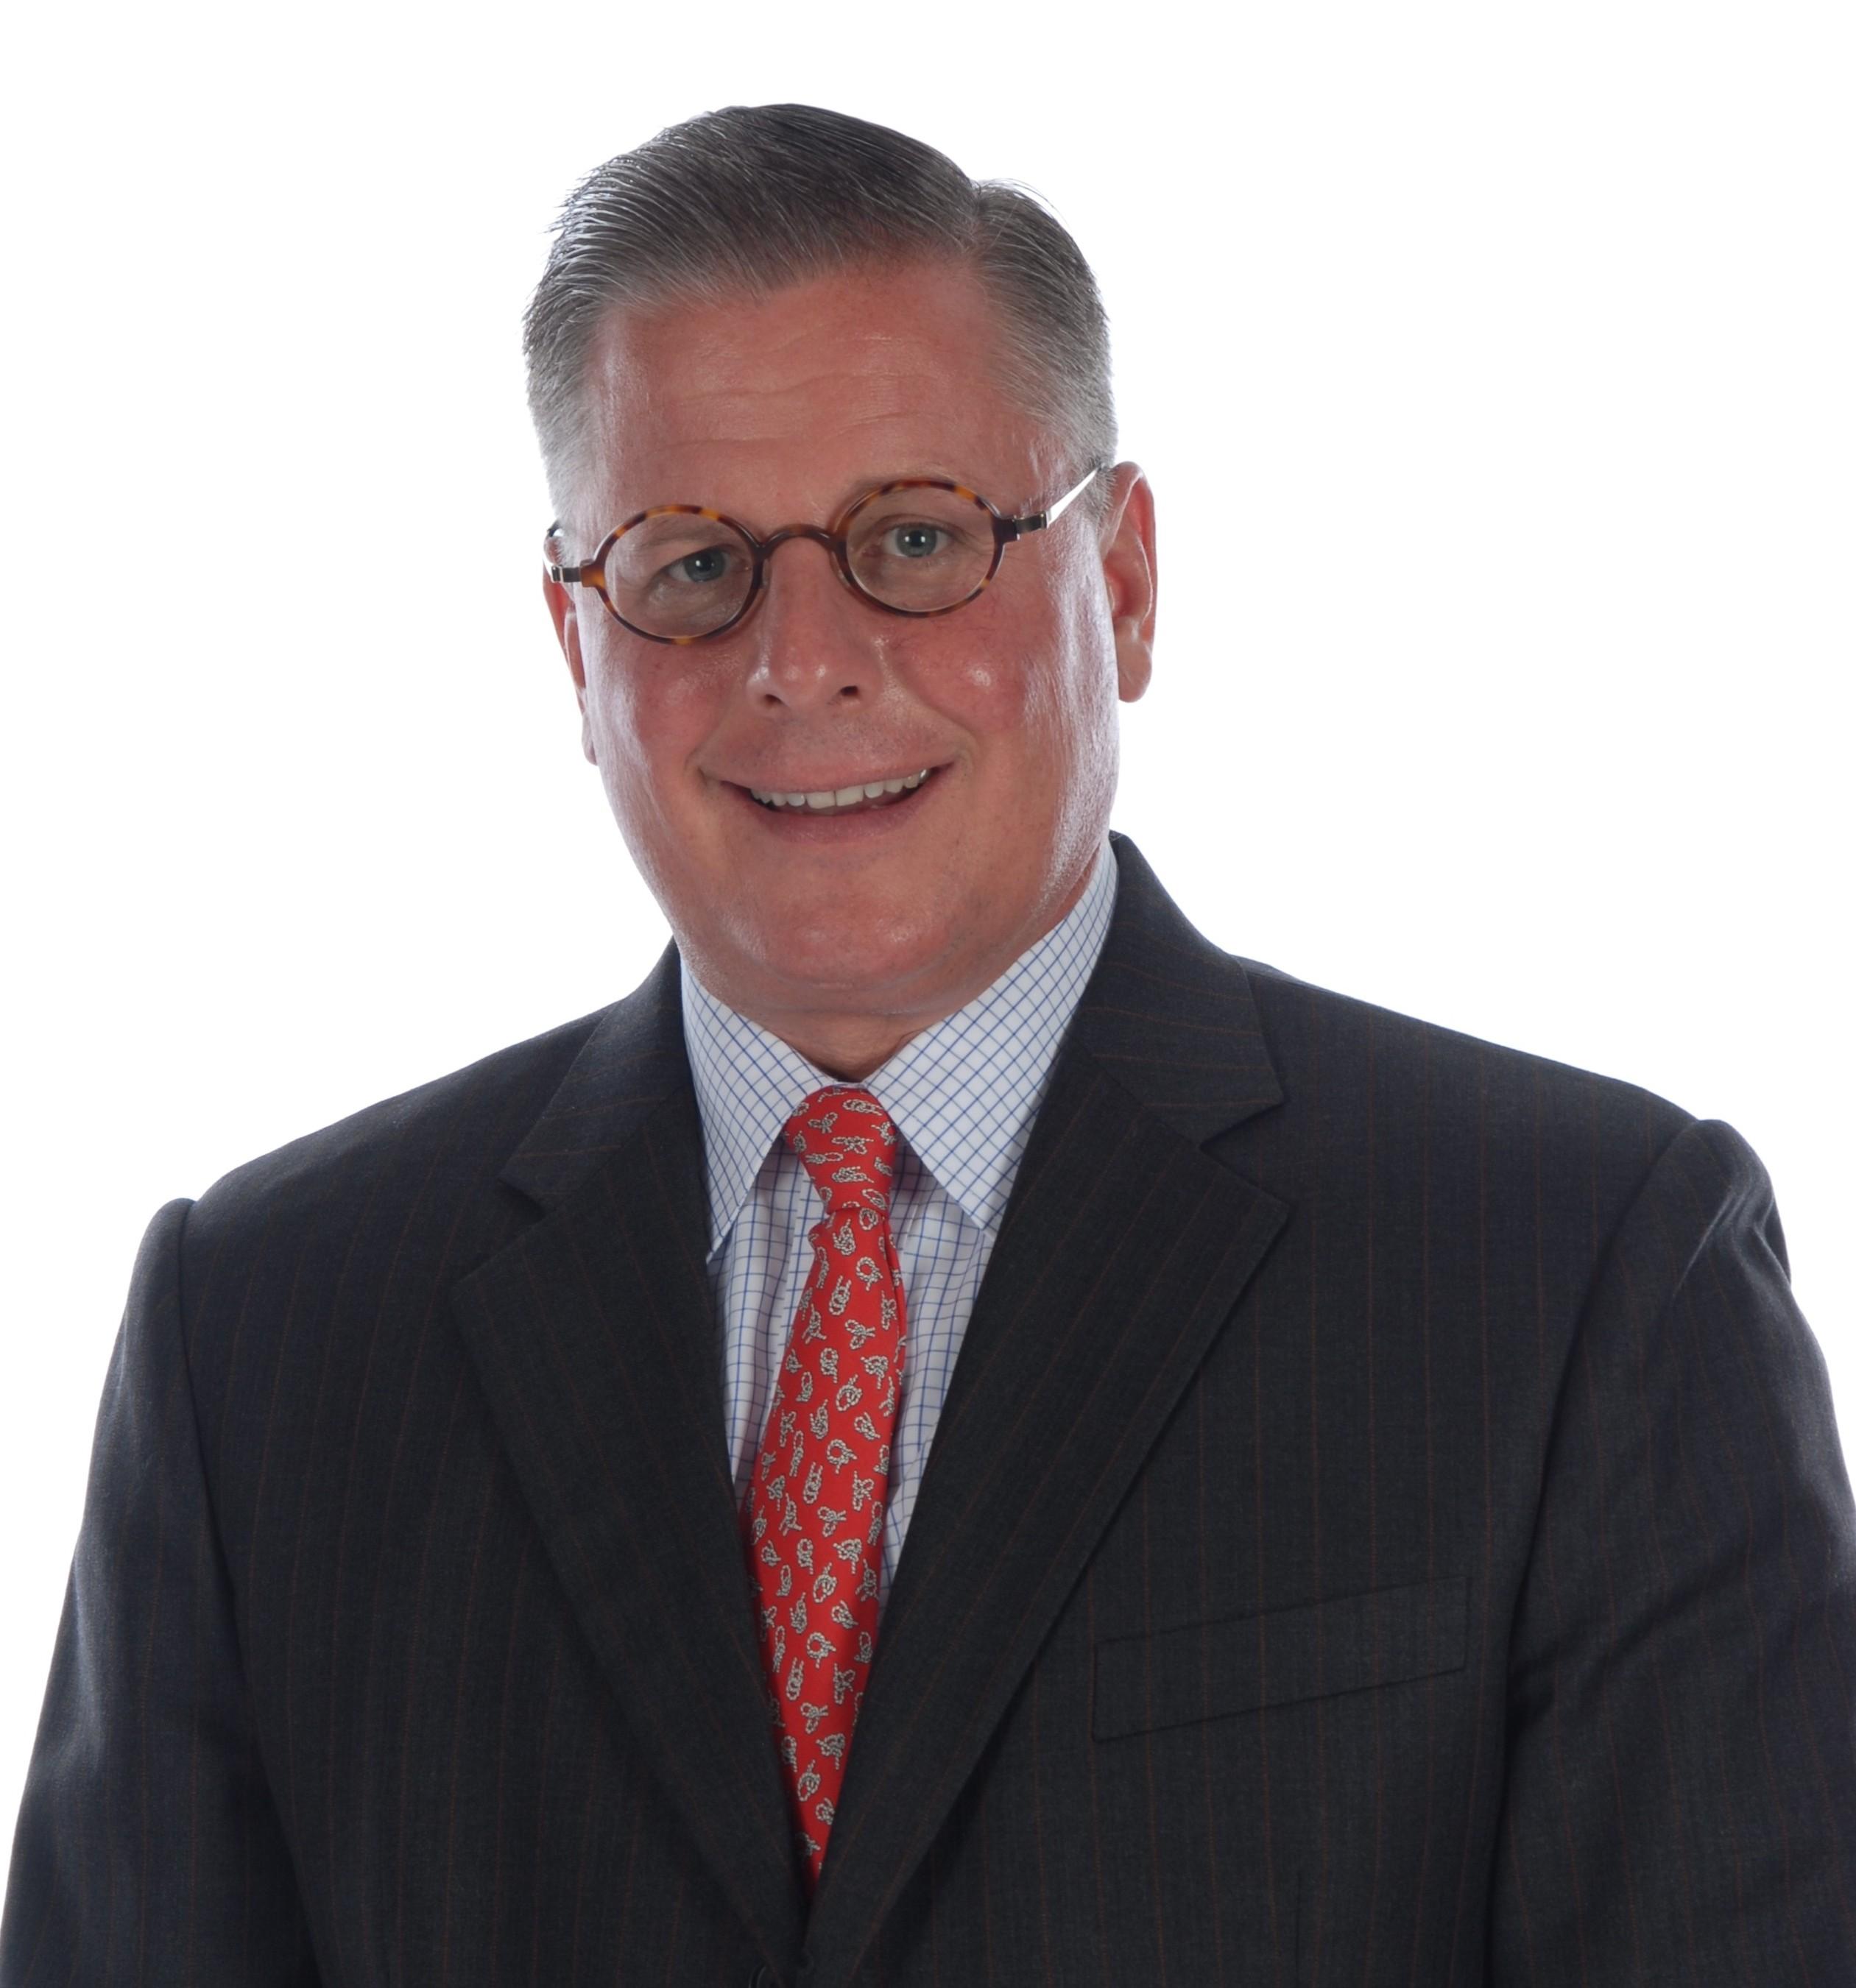 Daniel Witt, B.B.A.'83, Public Administration; MBA '84